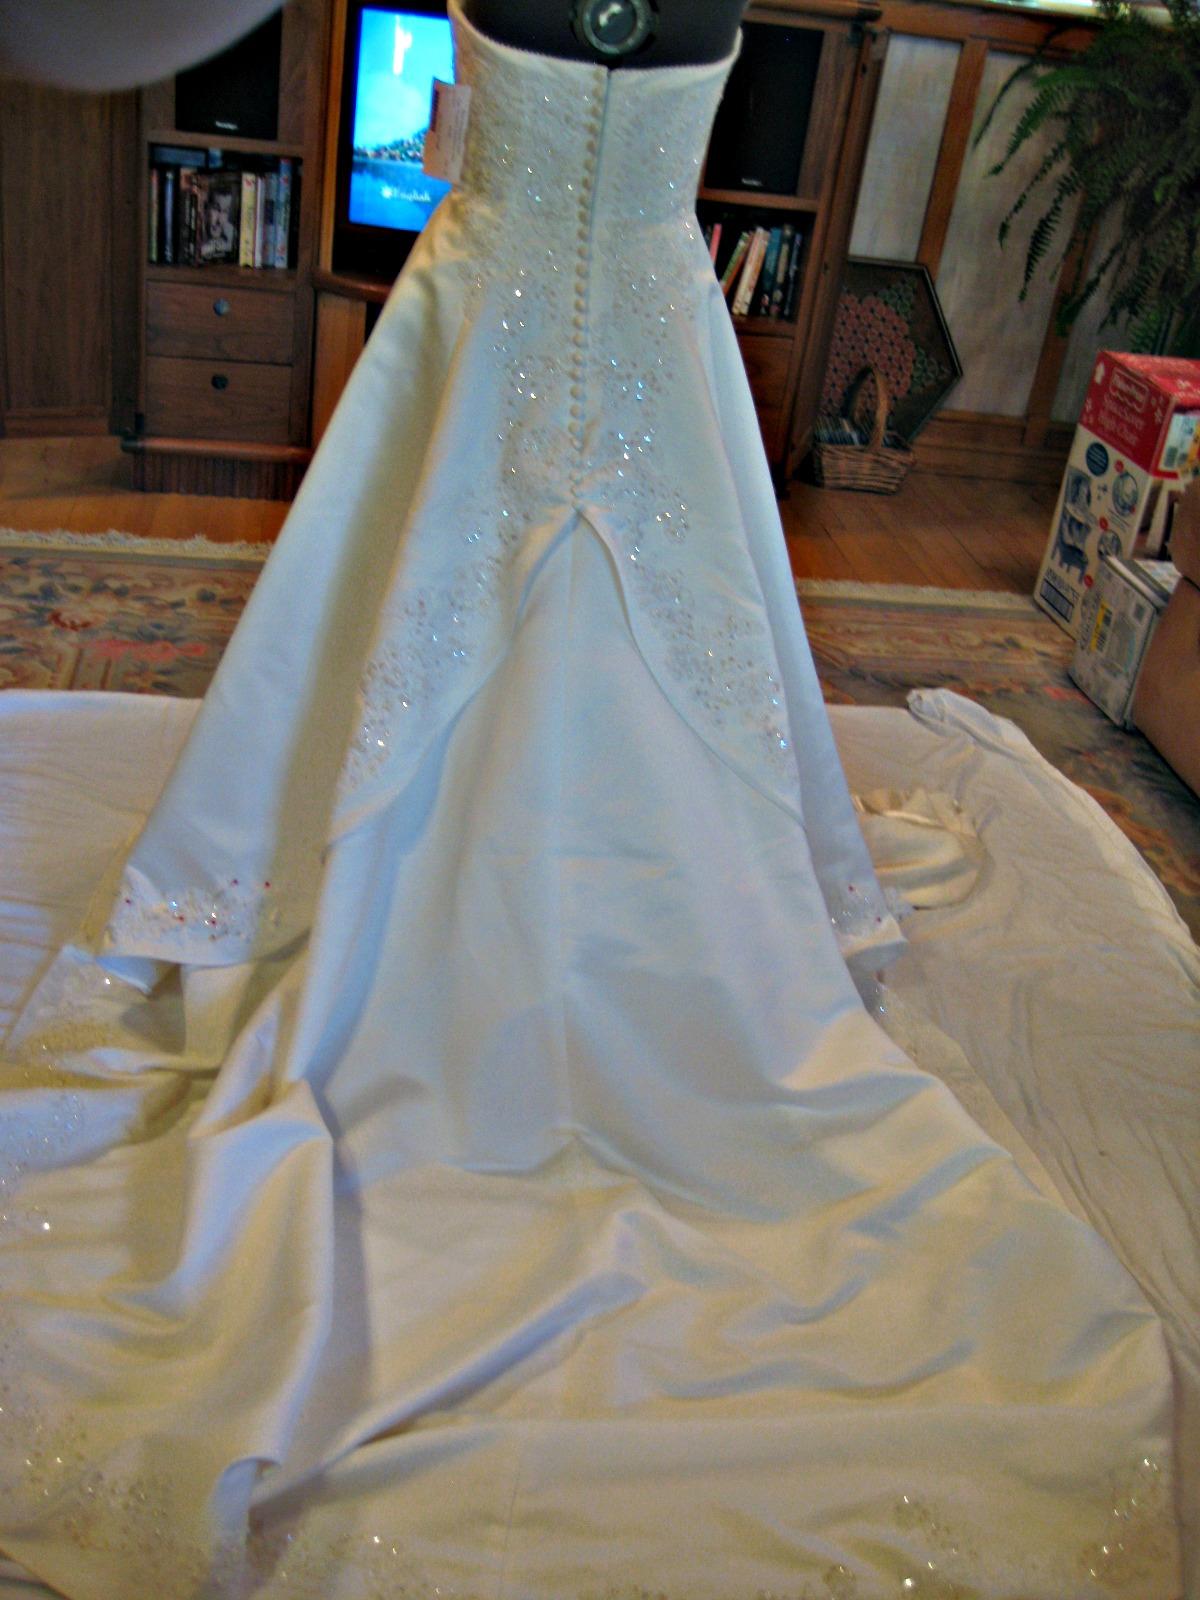 Fine Princess Diaries Wedding Dress Pictures Inspiration - Wedding ...